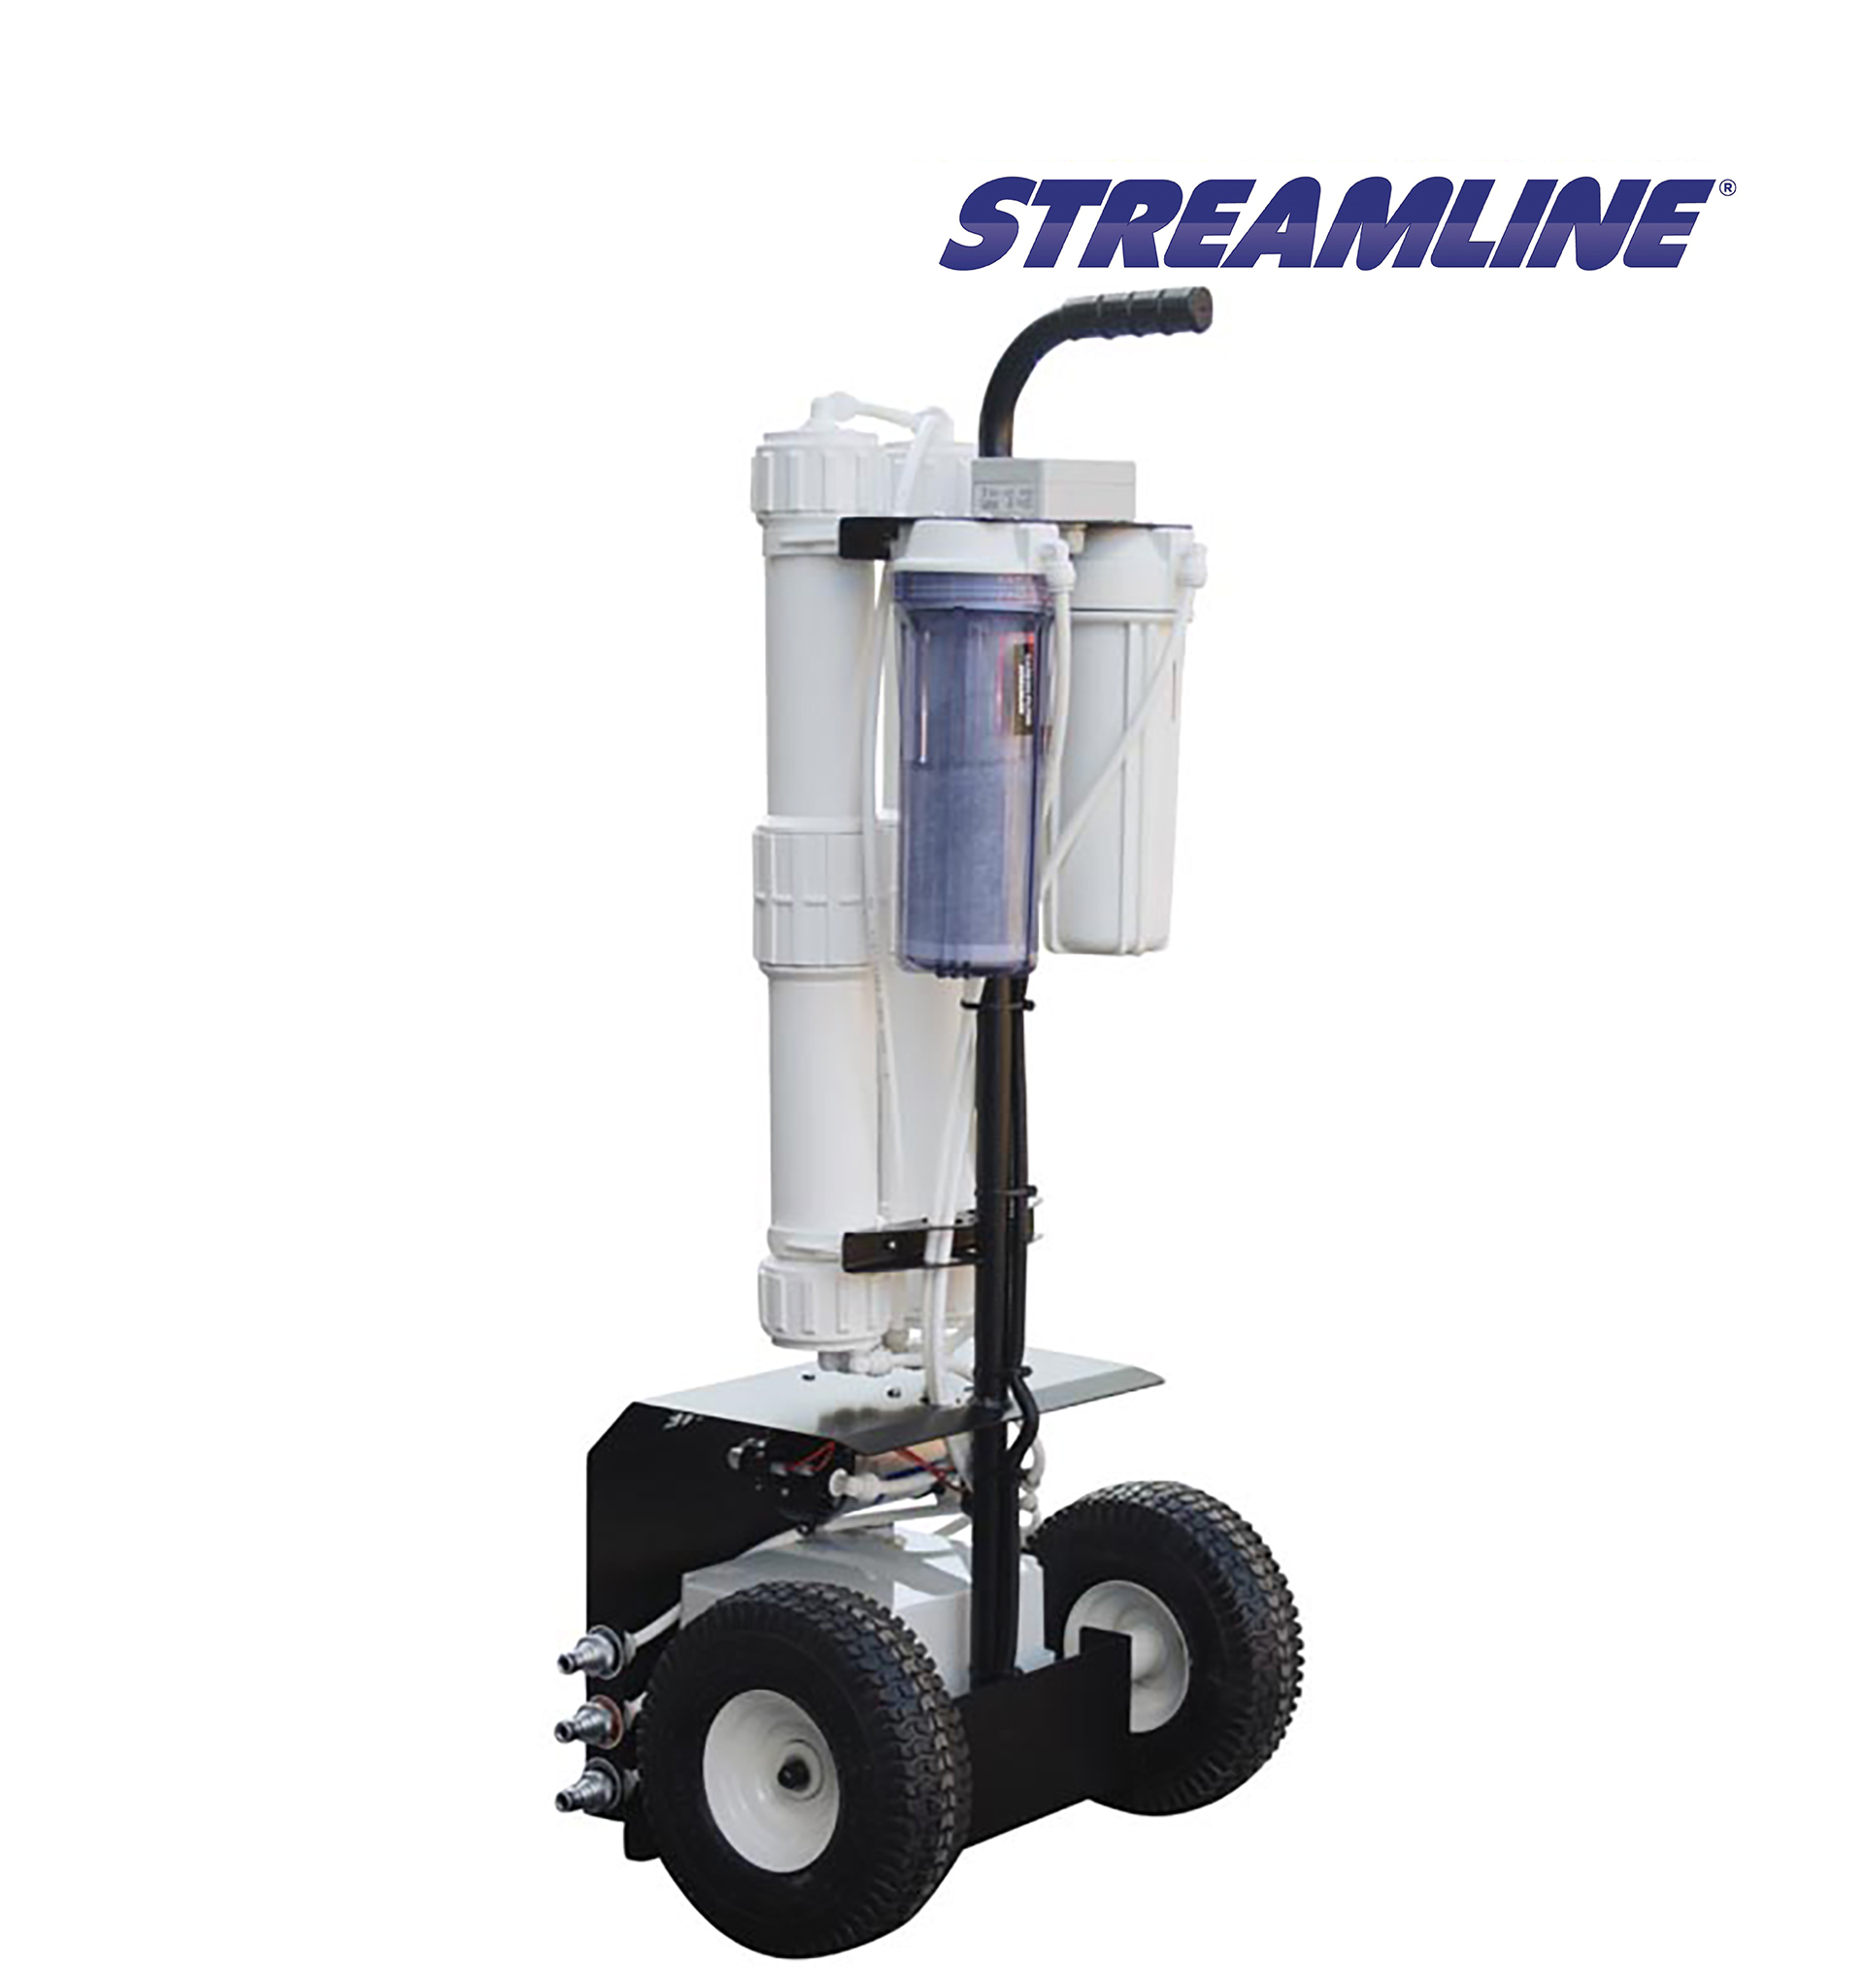 Streamline Mobi Midget R.O. DI Portable Trolley 230 Volt